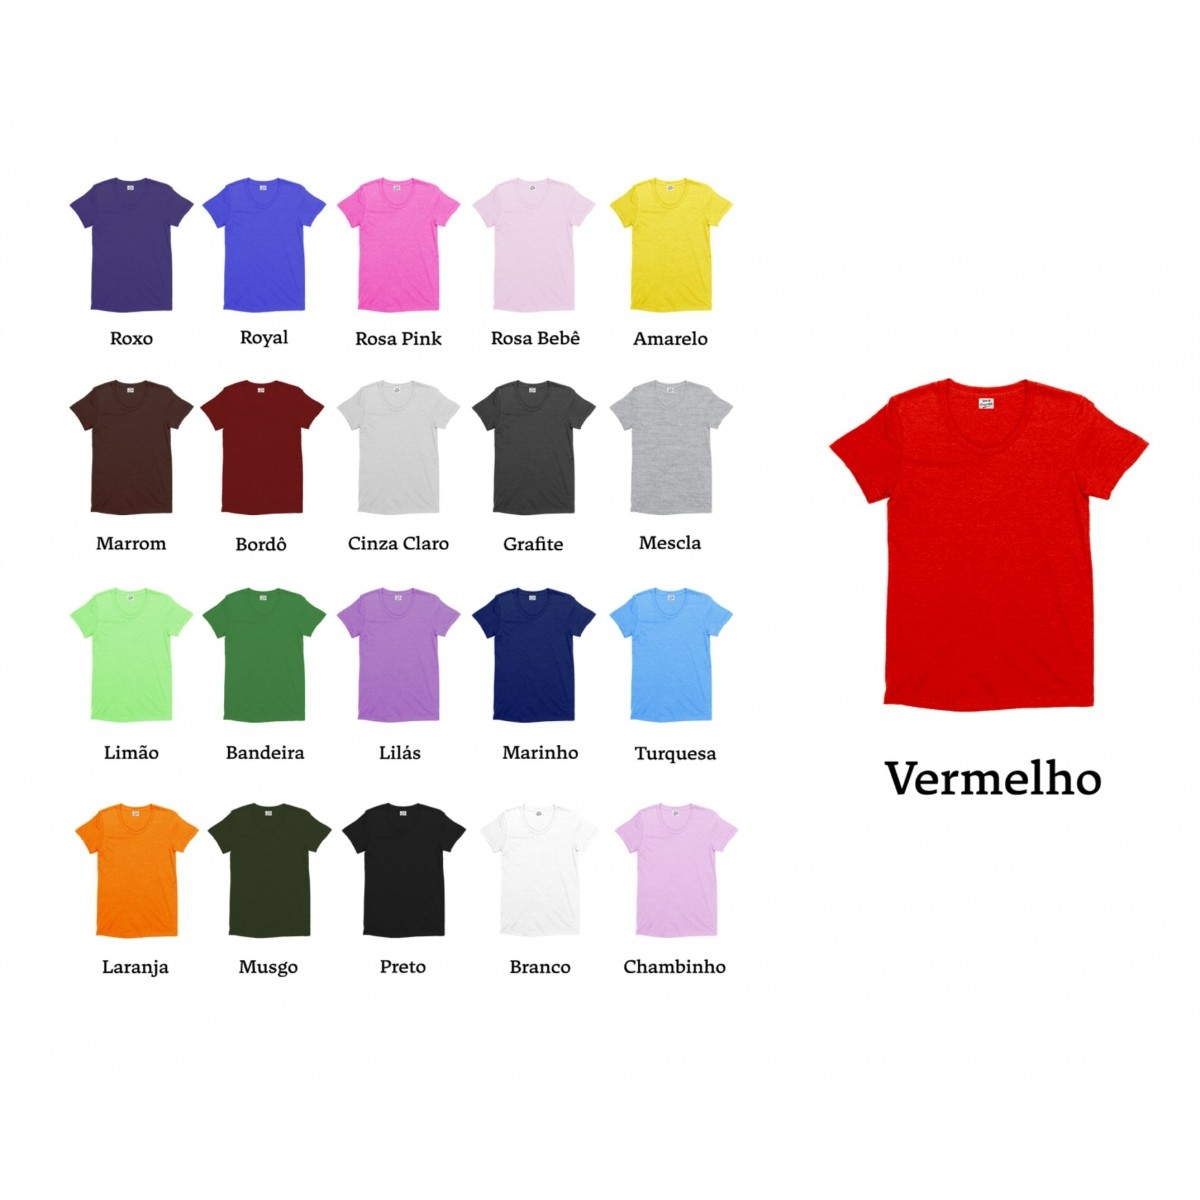 Camiseta baby look Personalizada para Despedida de Solteira, Camiseta team bride, Bride, Time da Noiva e Noiva.